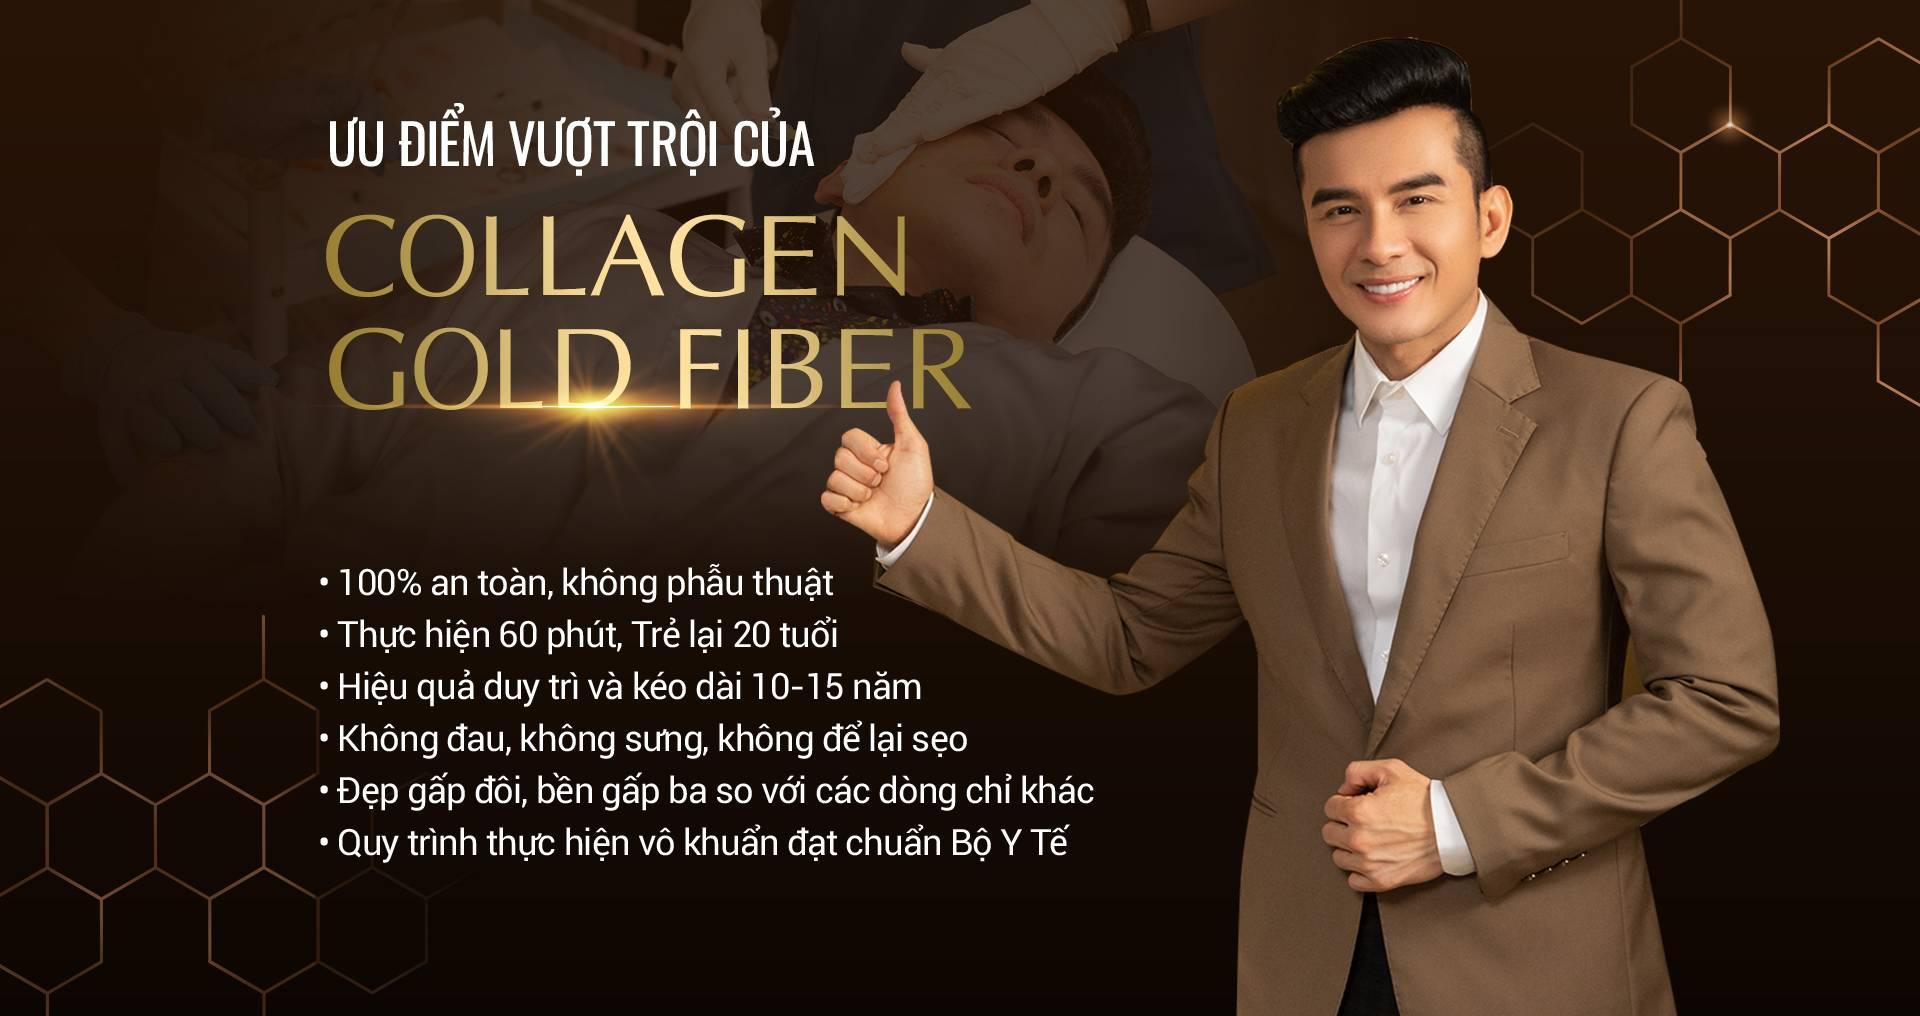 pc-uu-diem-vuot-troi-cang-chi-collagen